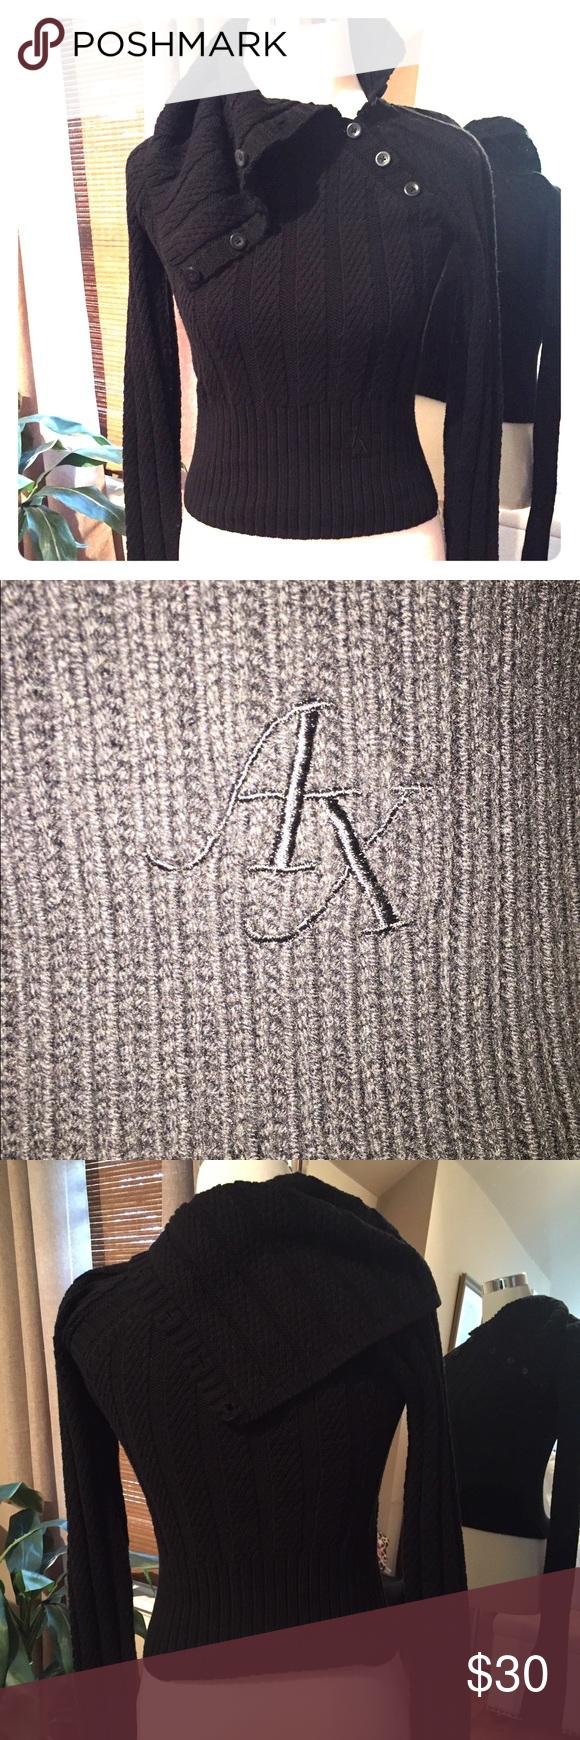 Armani Exchange cowl neck sweater Black AX sweater excellent condition A/X Armani Exchange Sweaters Cowl & Turtlenecks